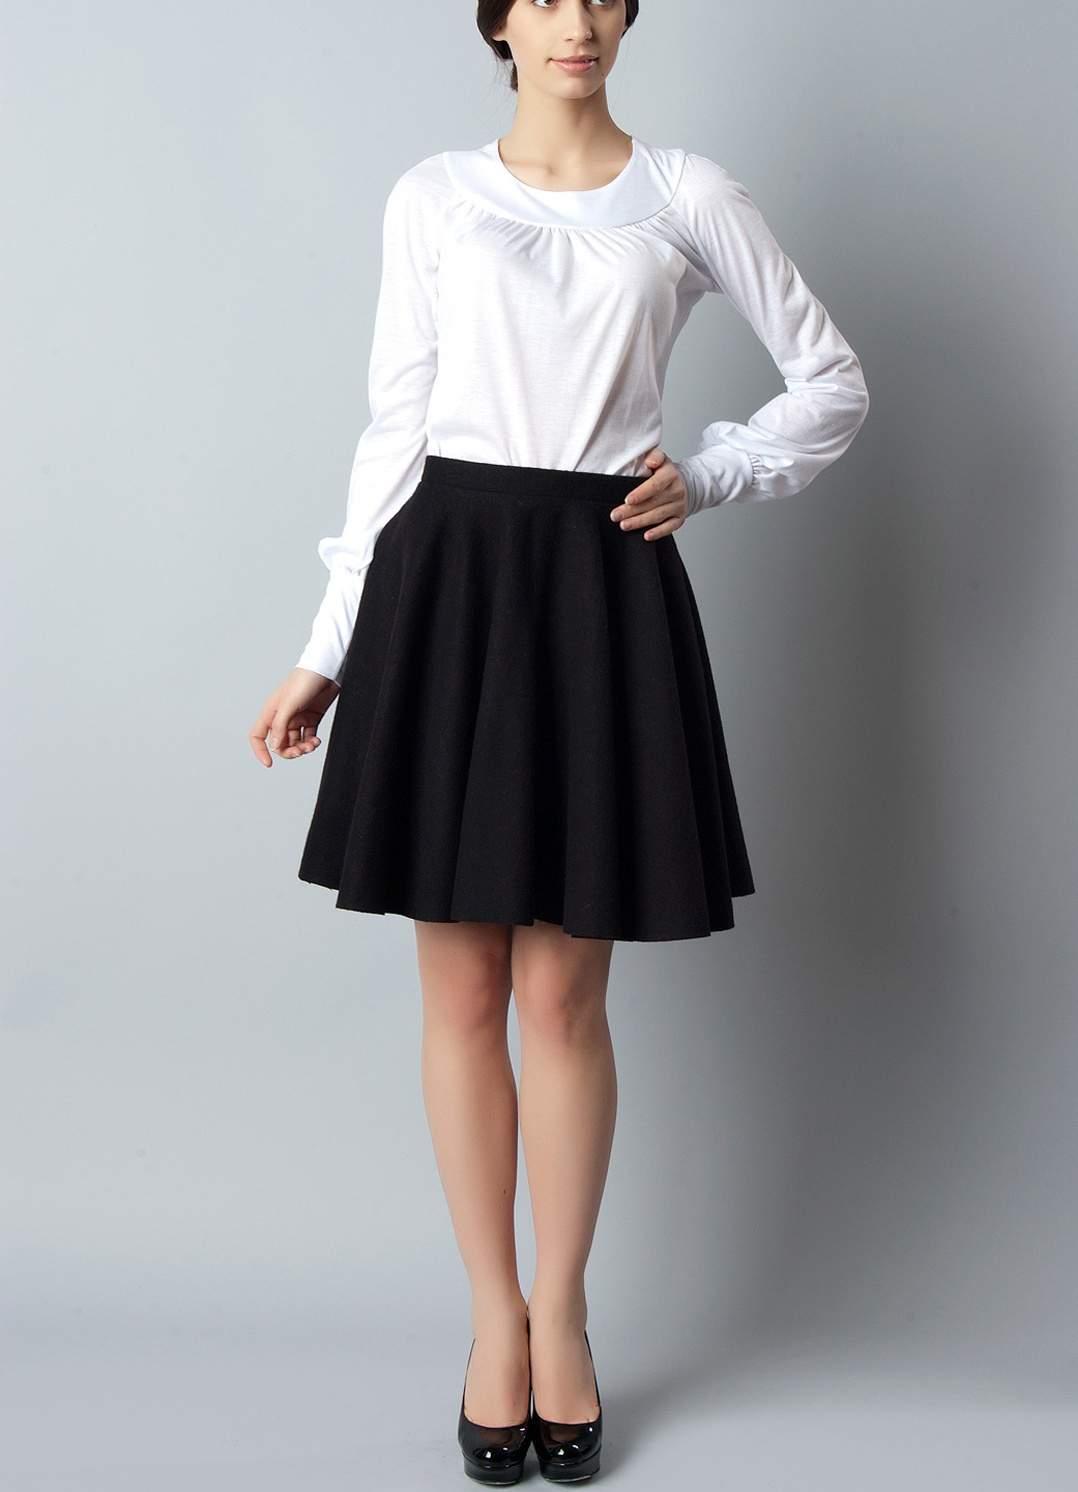 юбка клеш в школу